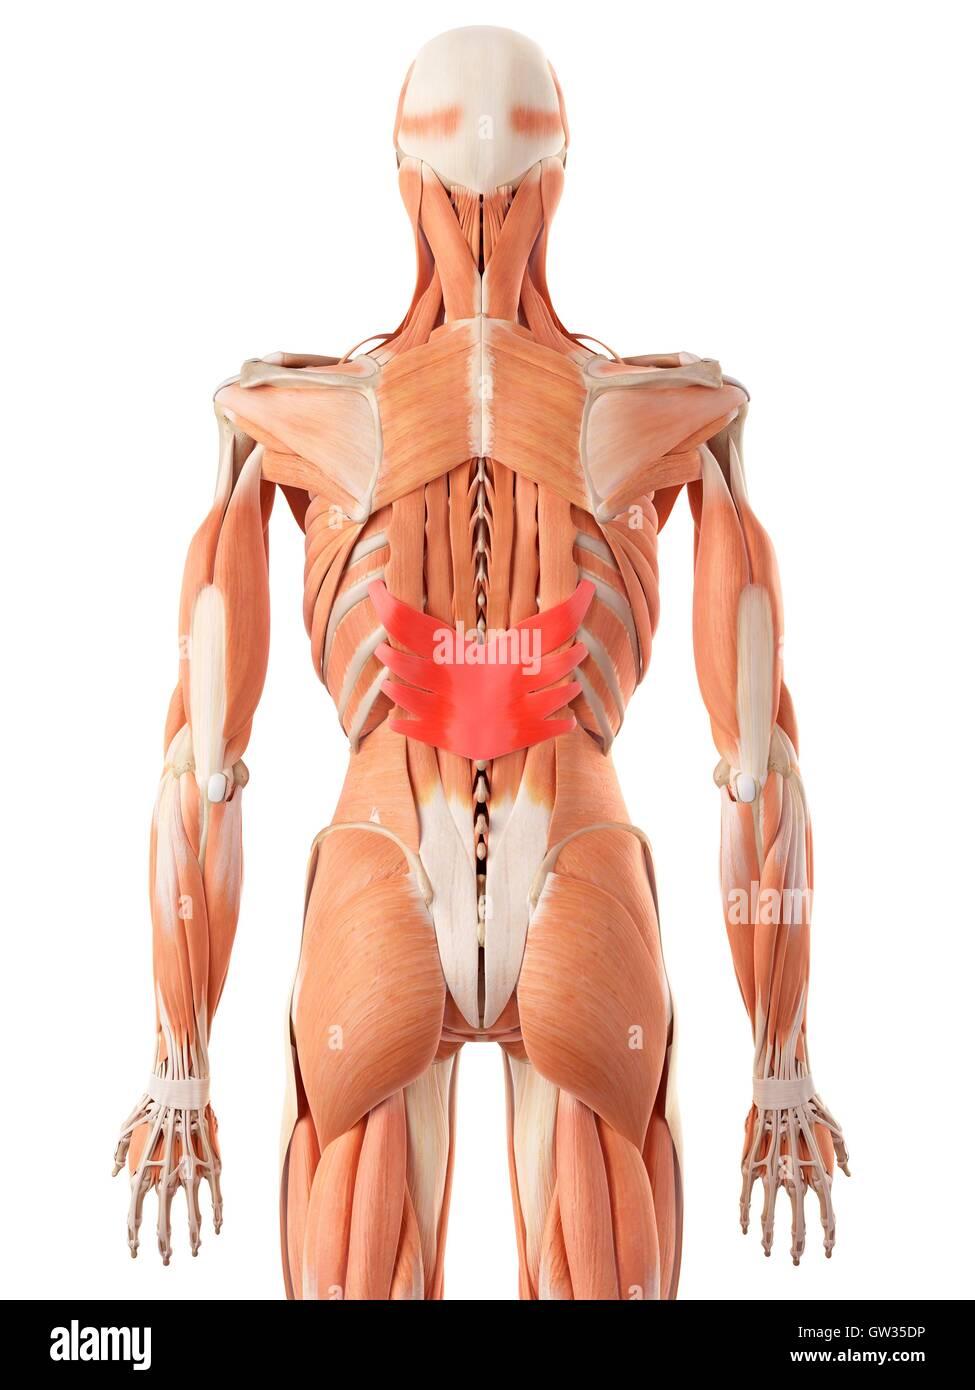 Human back muscles, illustration Stock Photo: 118698770 - Alamy